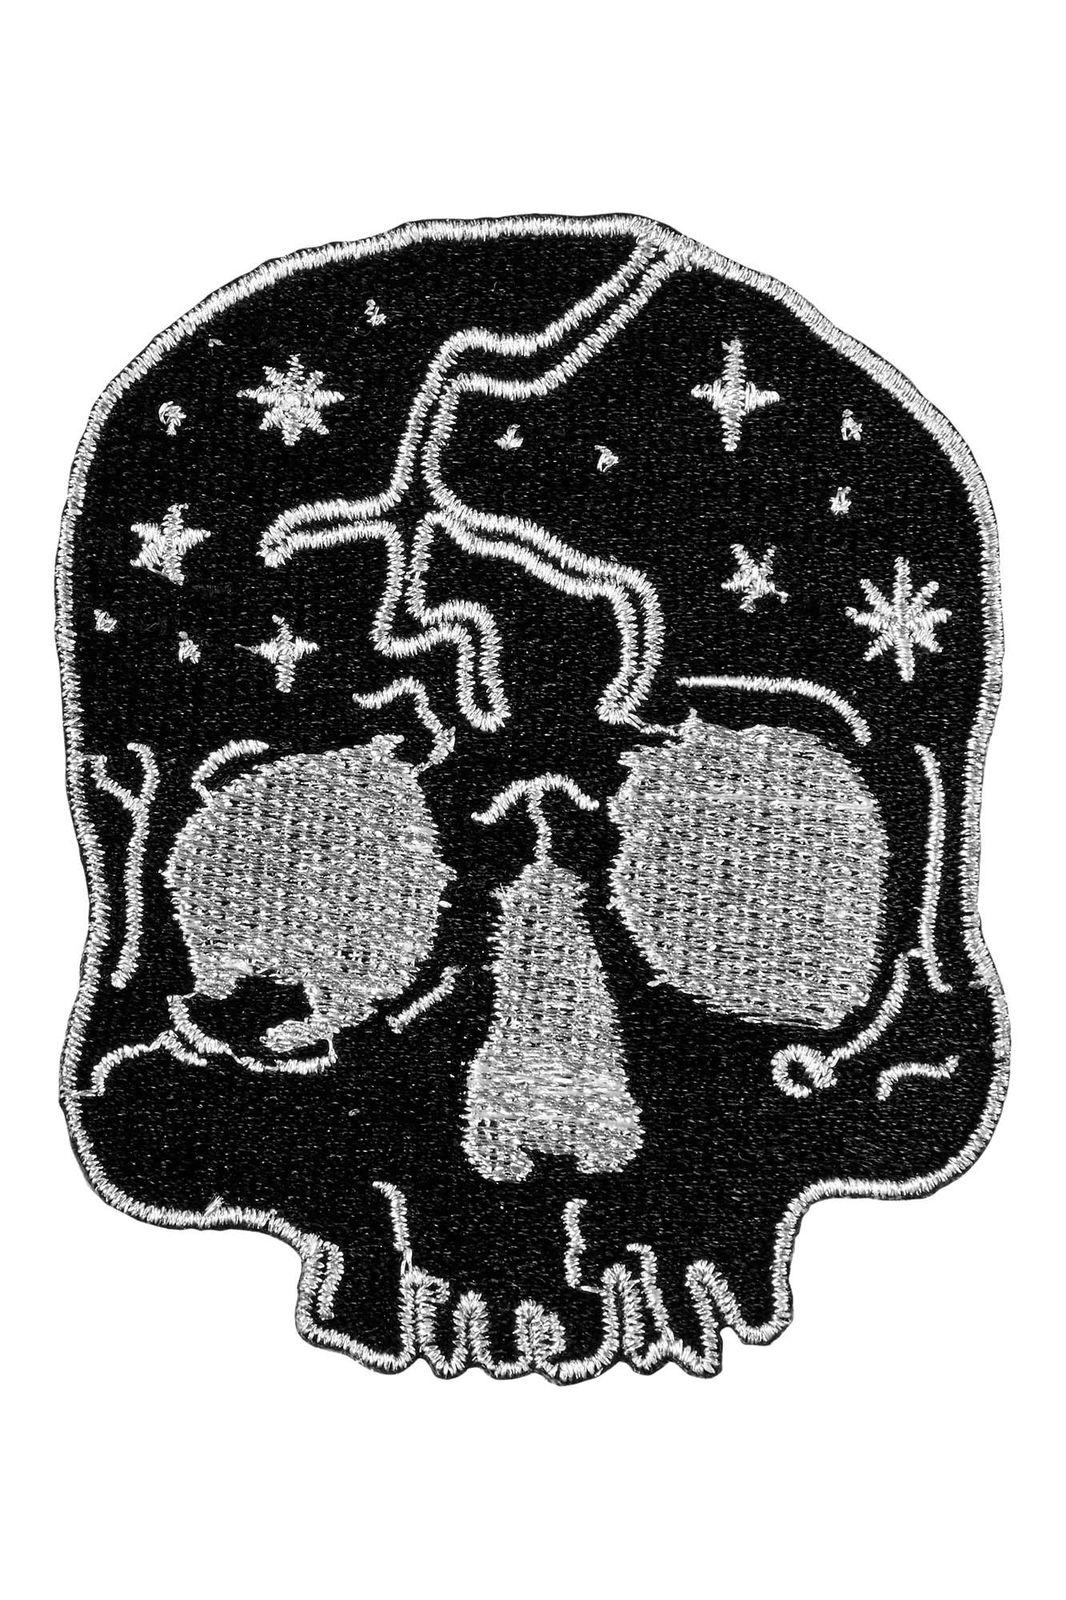 Dead Space Patch image